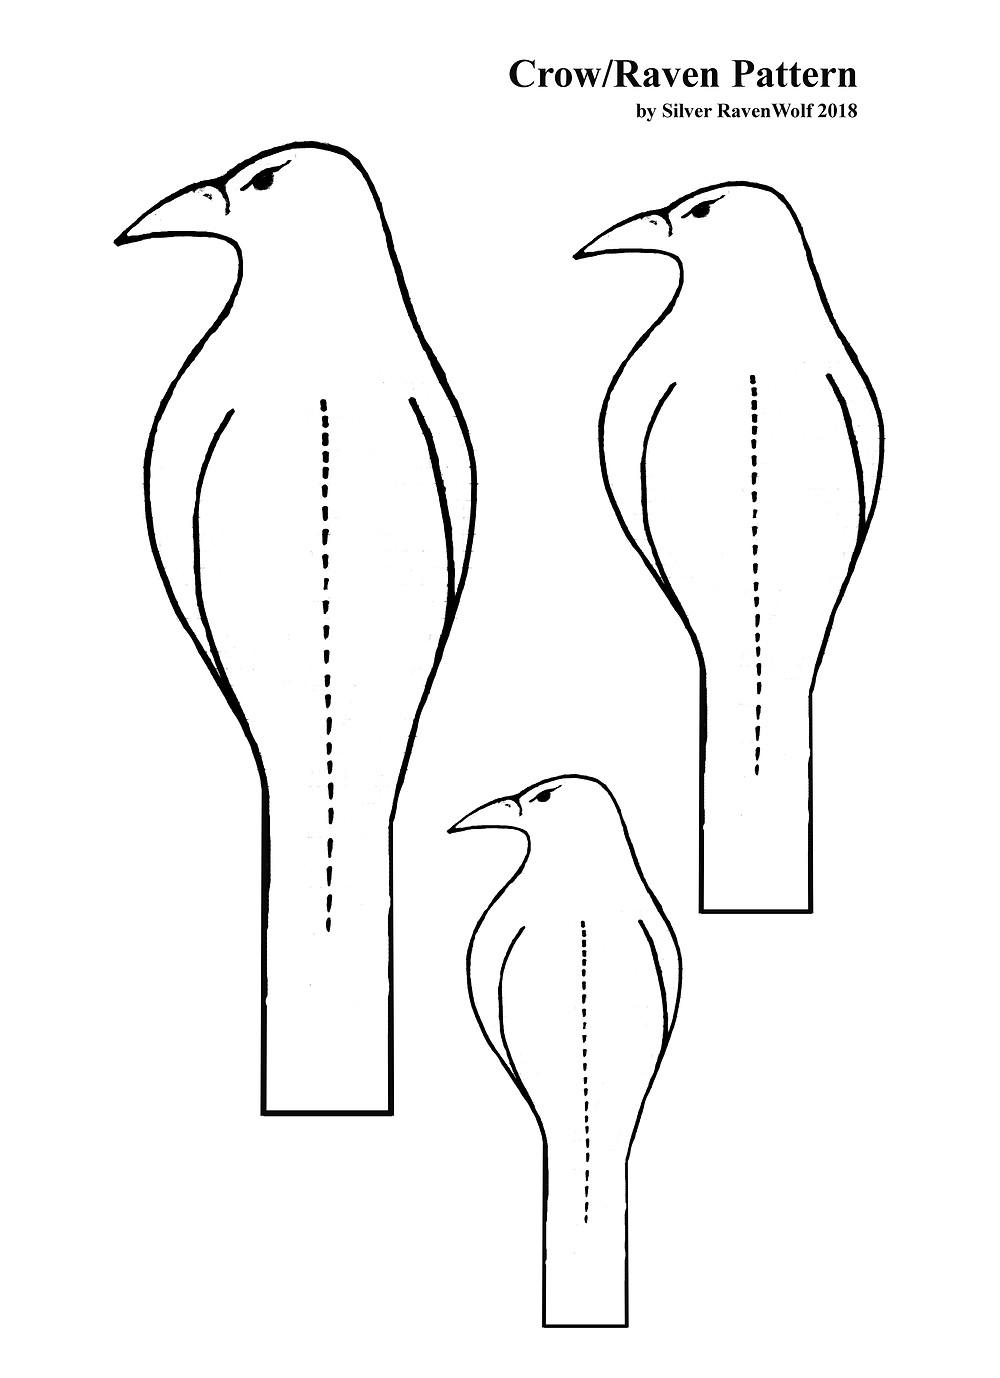 ravencrowpattern2018small.jpg